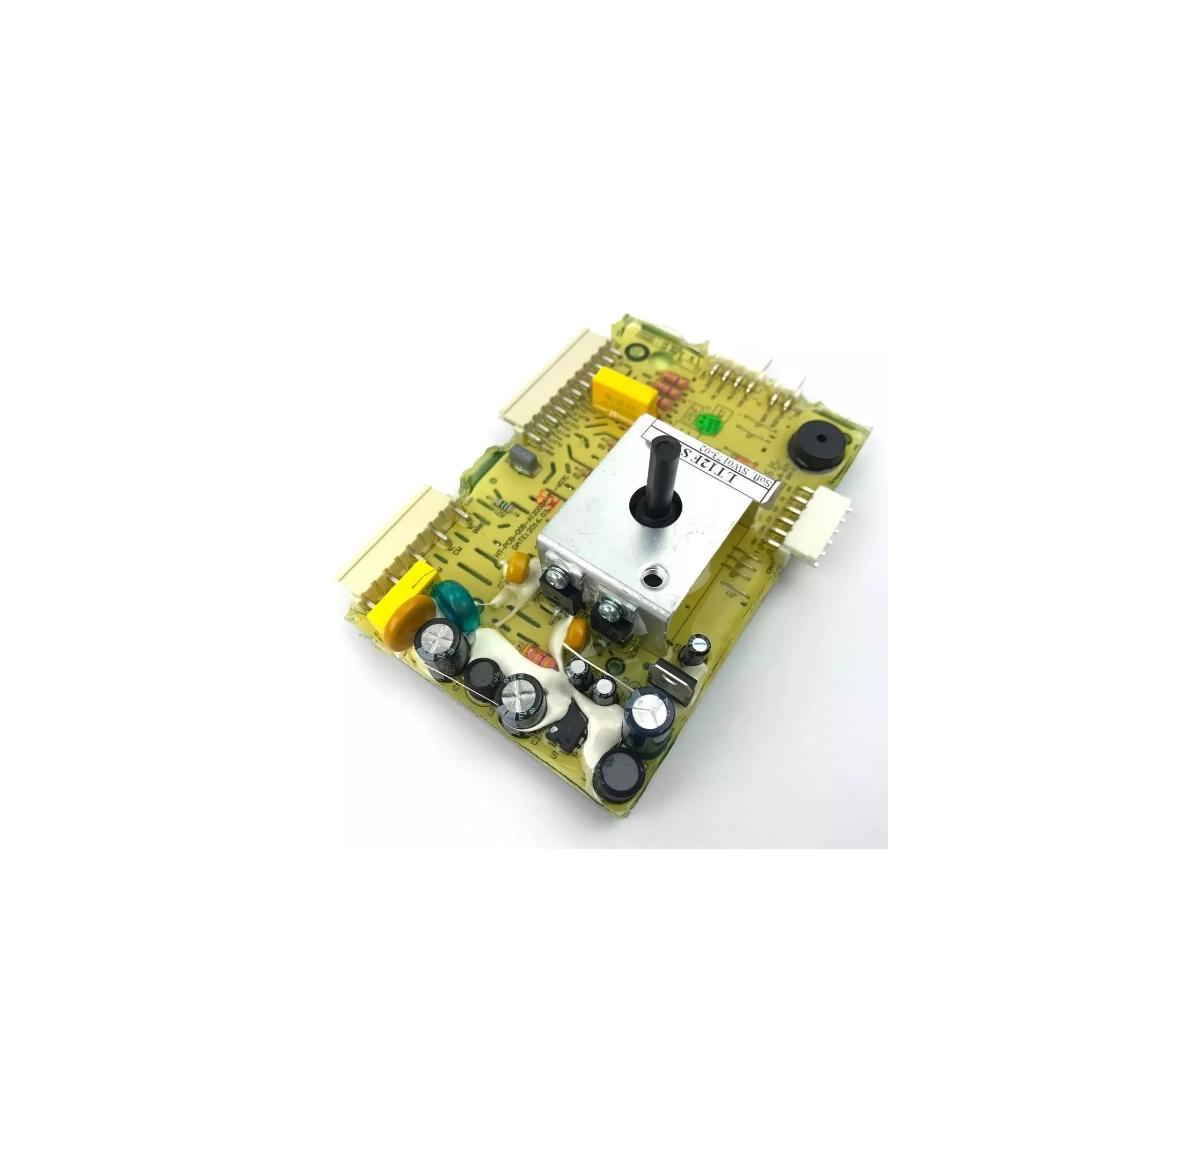 PLACA POTENCIA LTD12F - ELECTROLUX 70201326